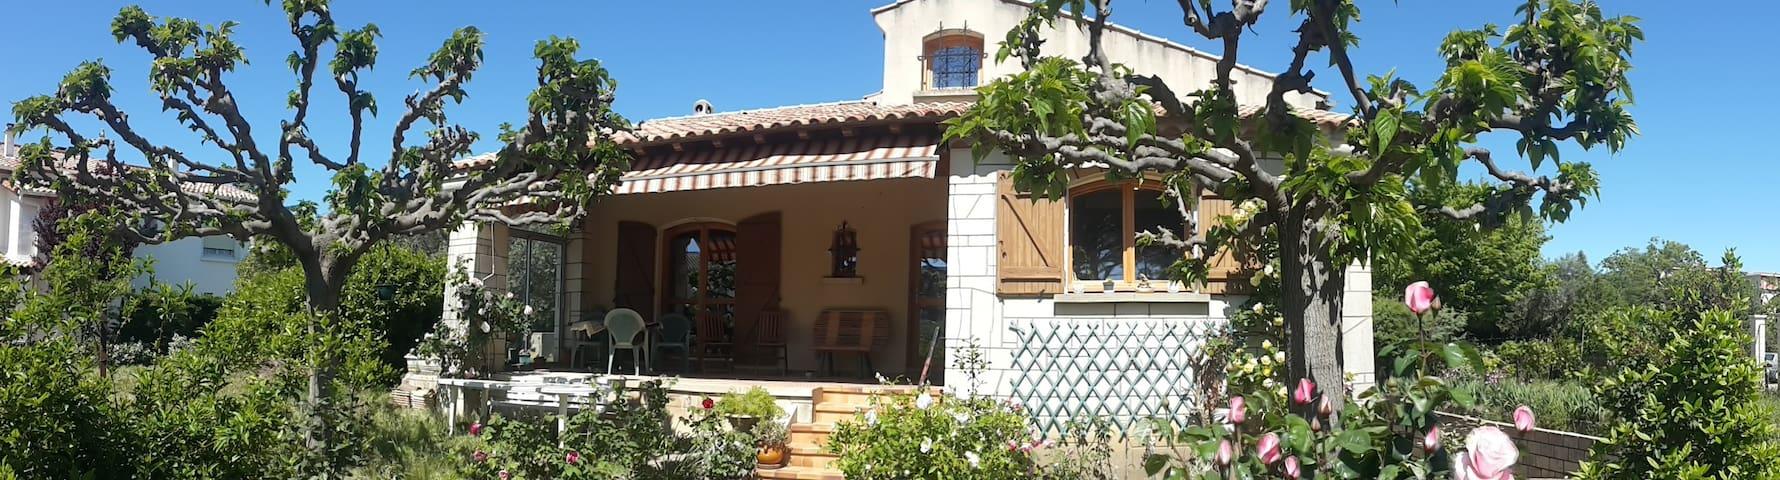 Villa moderne avec grand jardin, repos total! - Clermont-l'Hérault - Villa